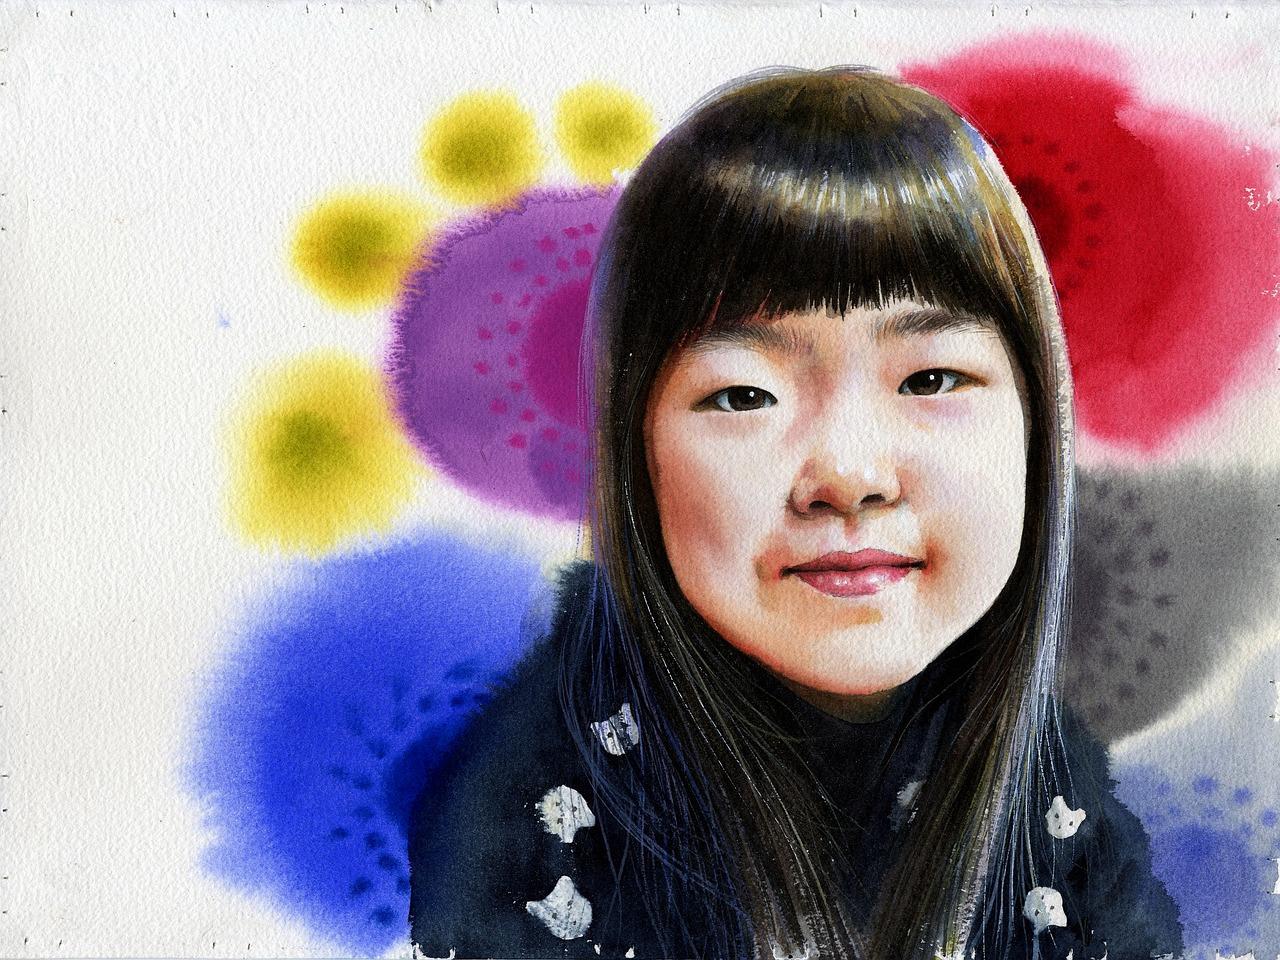 1280x960 Watercolor,portrait Watercolor,art,figure Paintings,watercolor